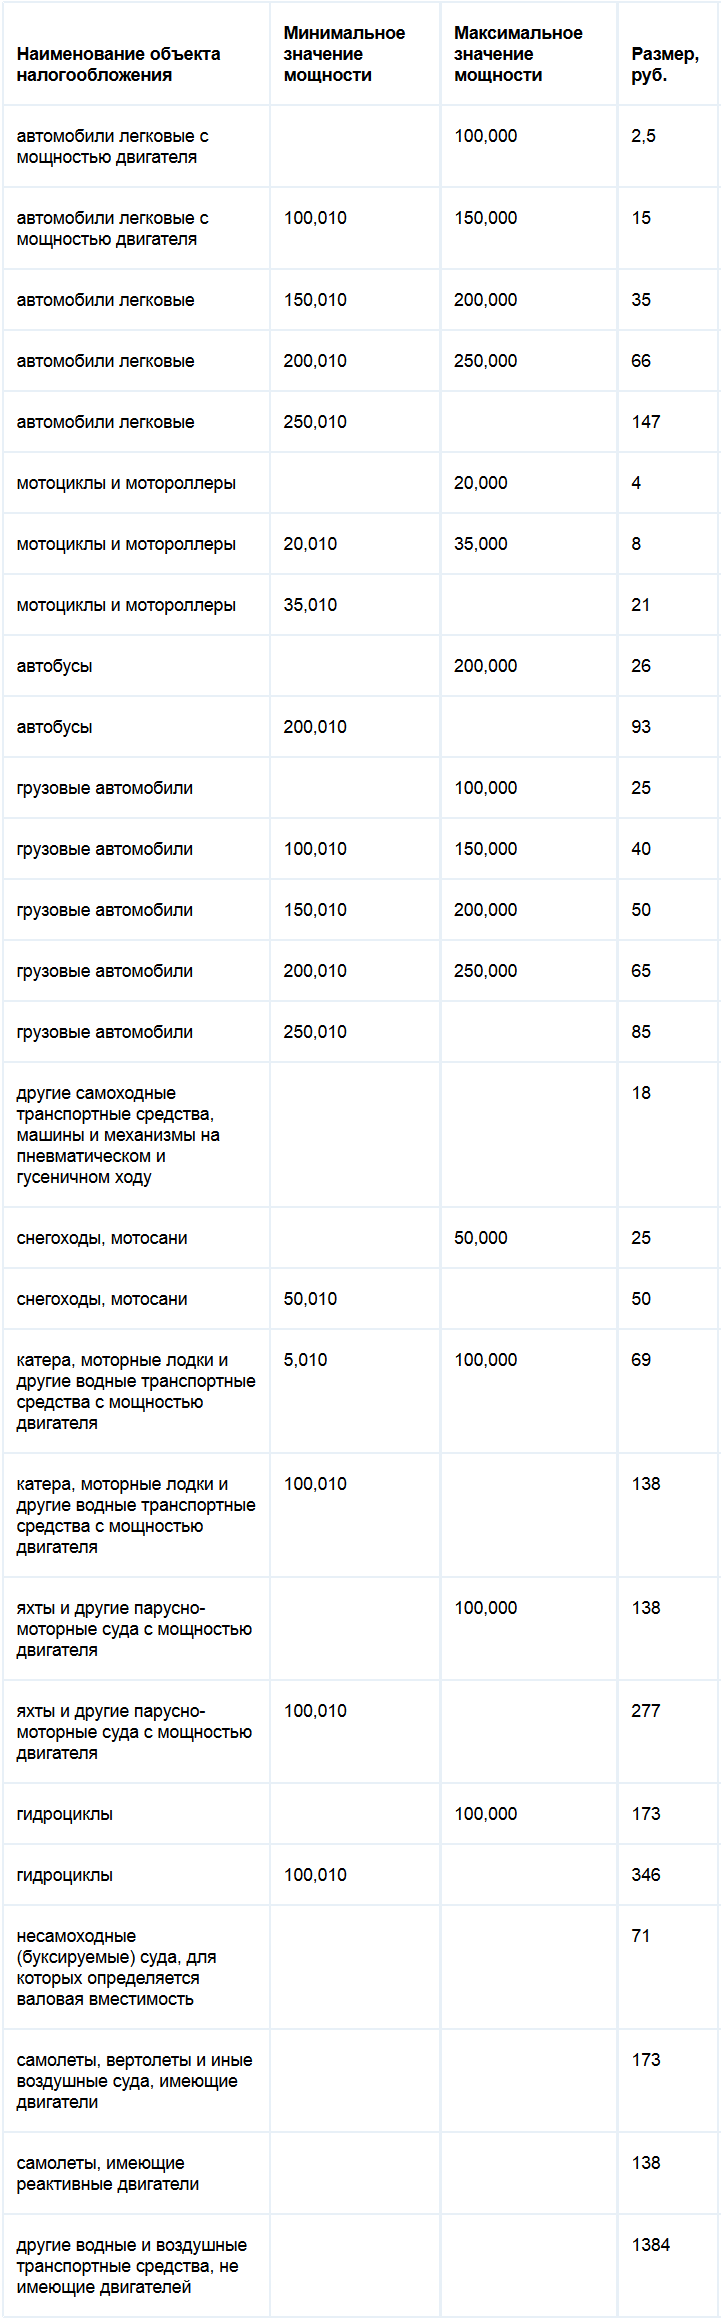 Ставки транспортного налога Калининградской области